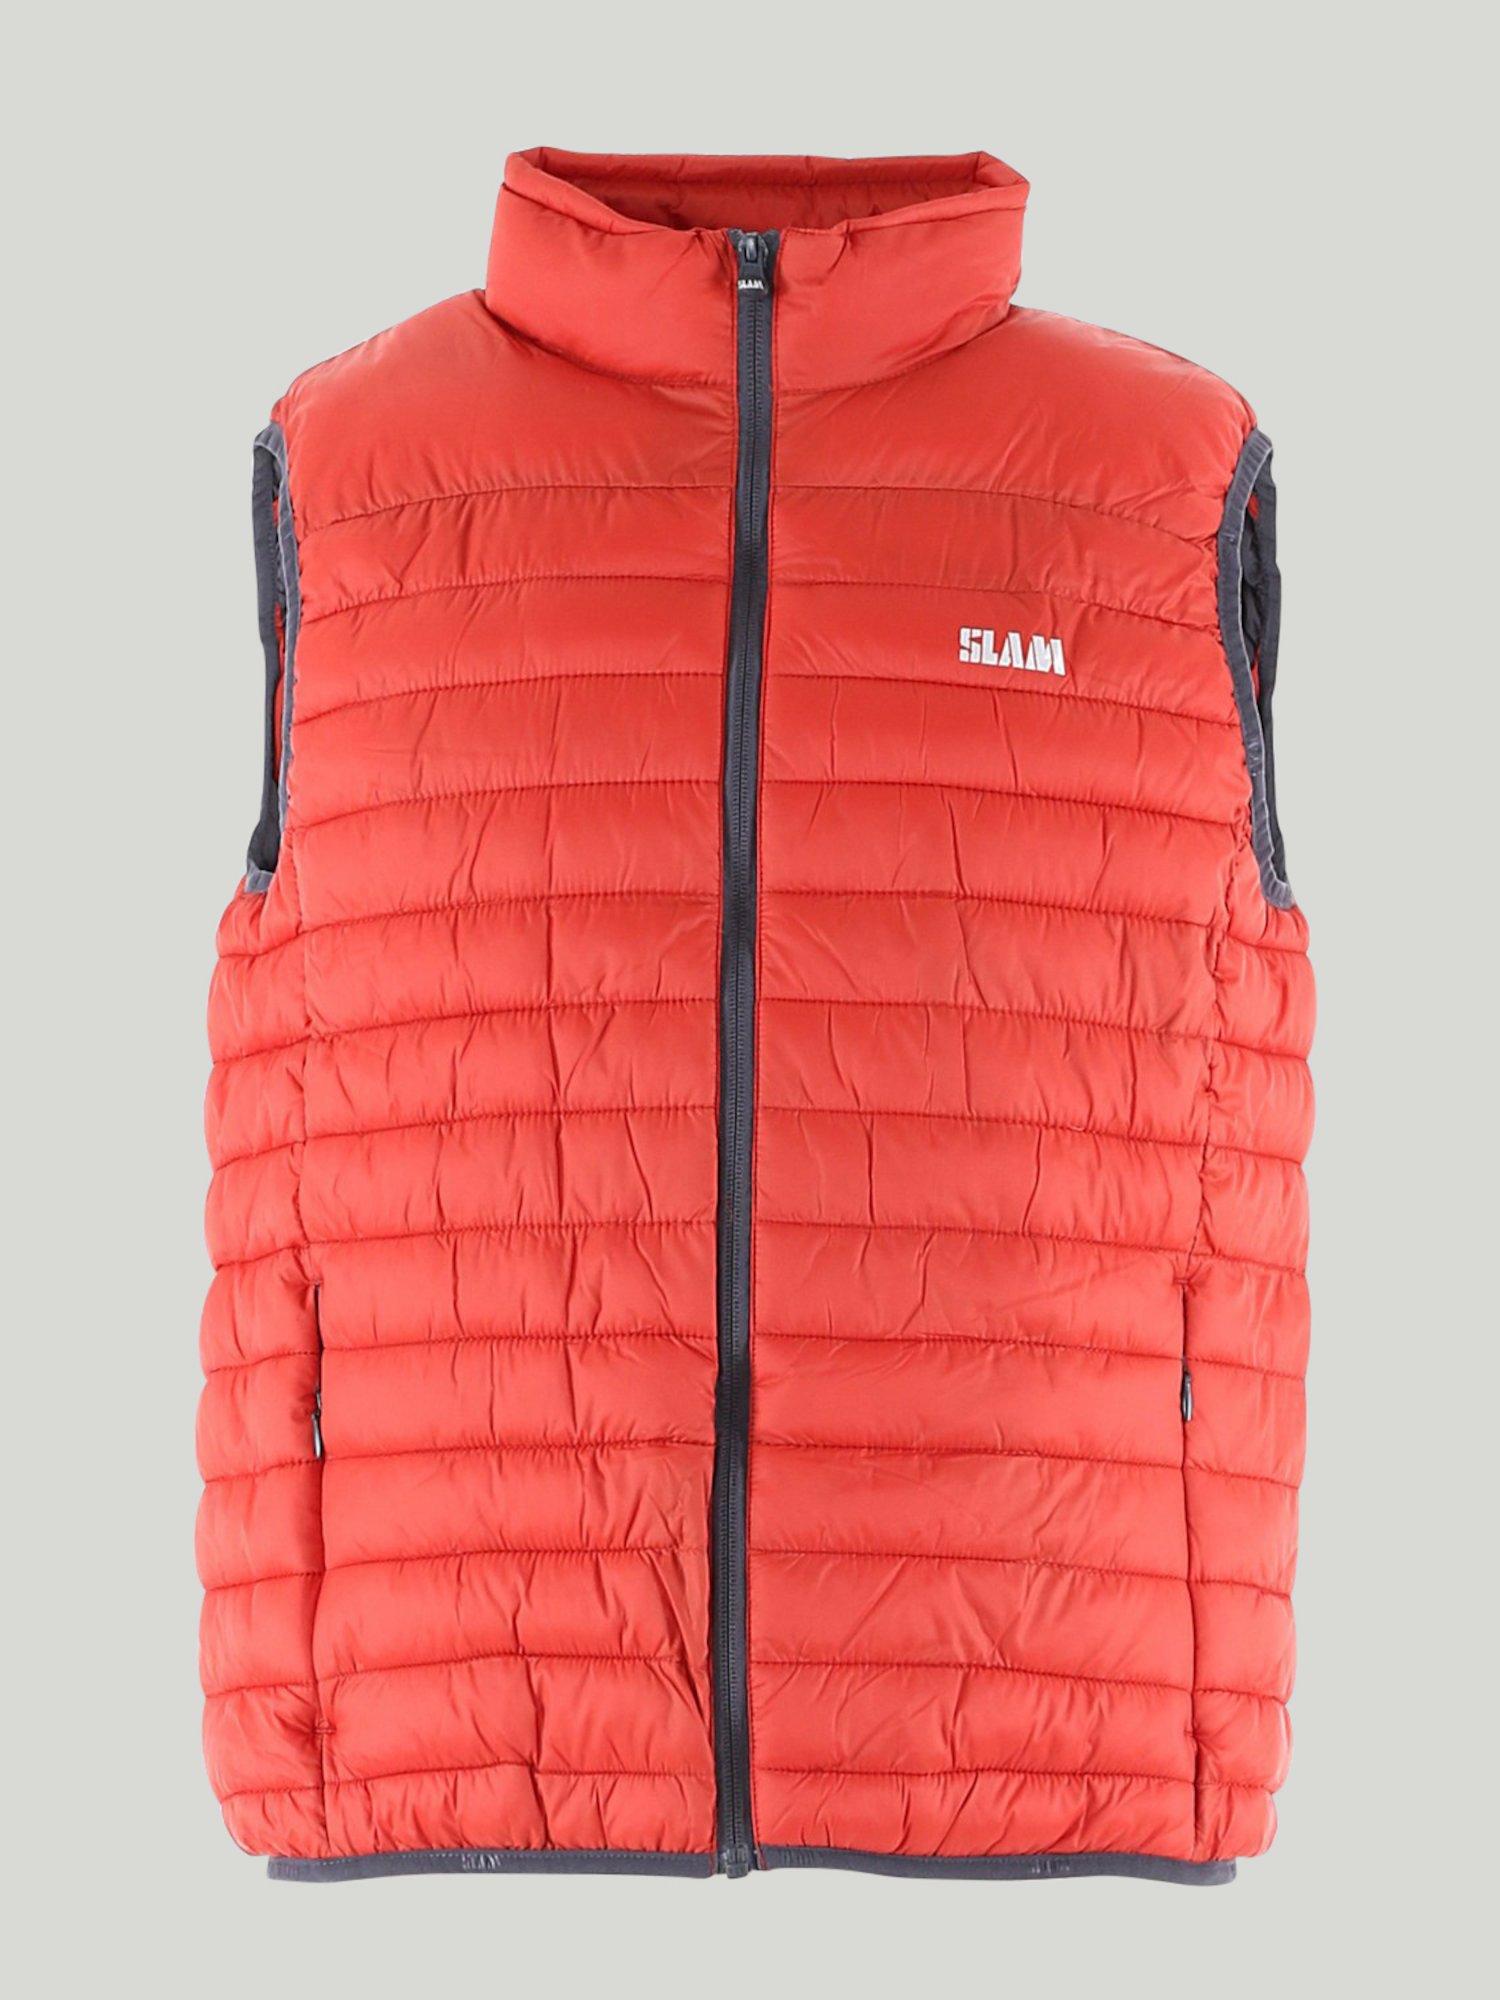 Rennell vest - Brick Red